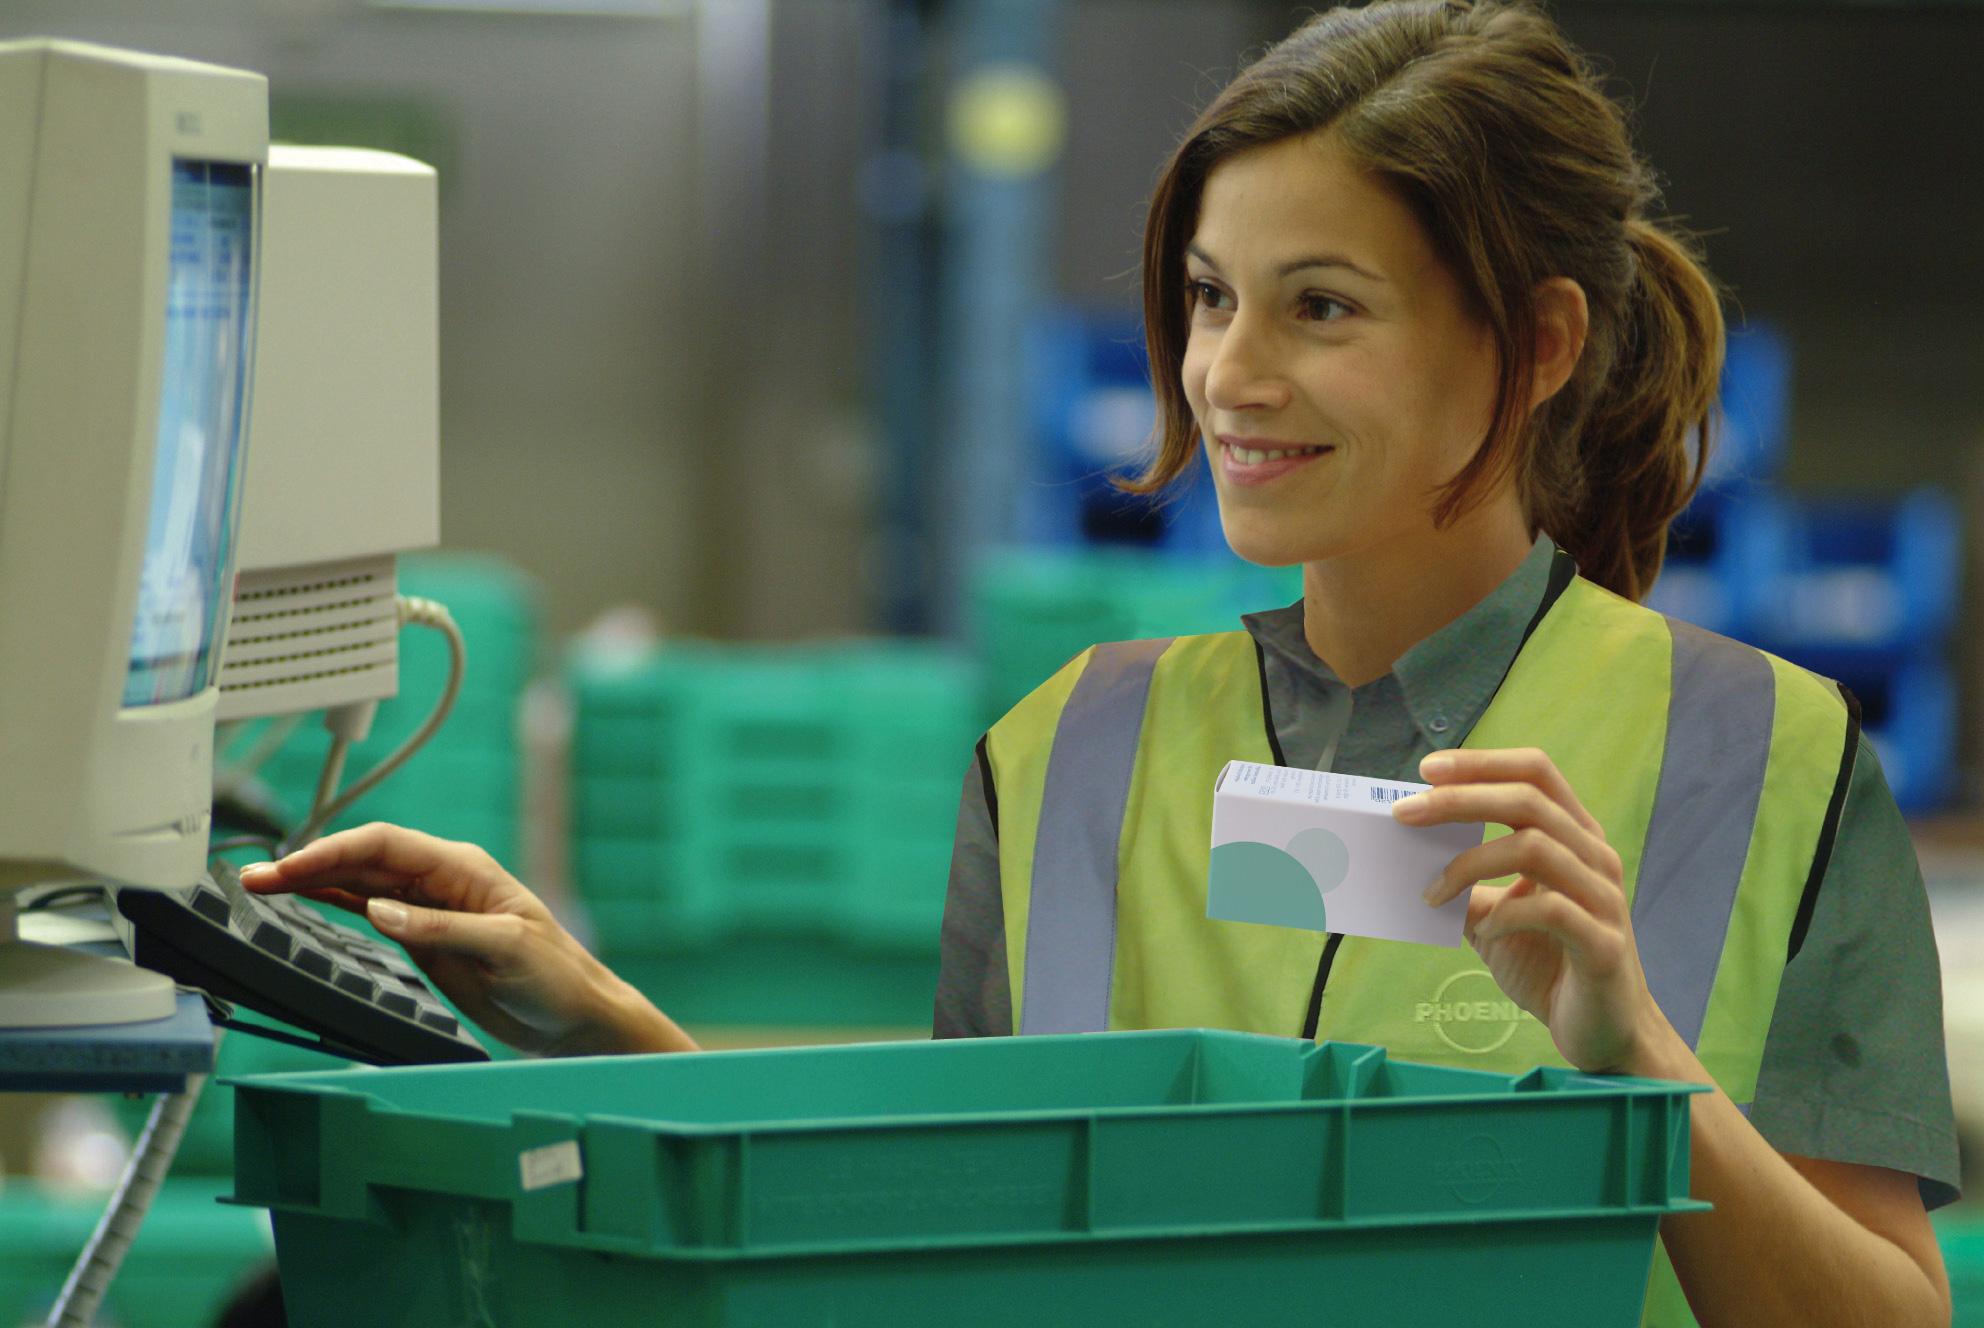 GlaxoSmithKline UK Pharmaceuticals selects PHOENIX in new Reduced Wholesale Model distribution agreement